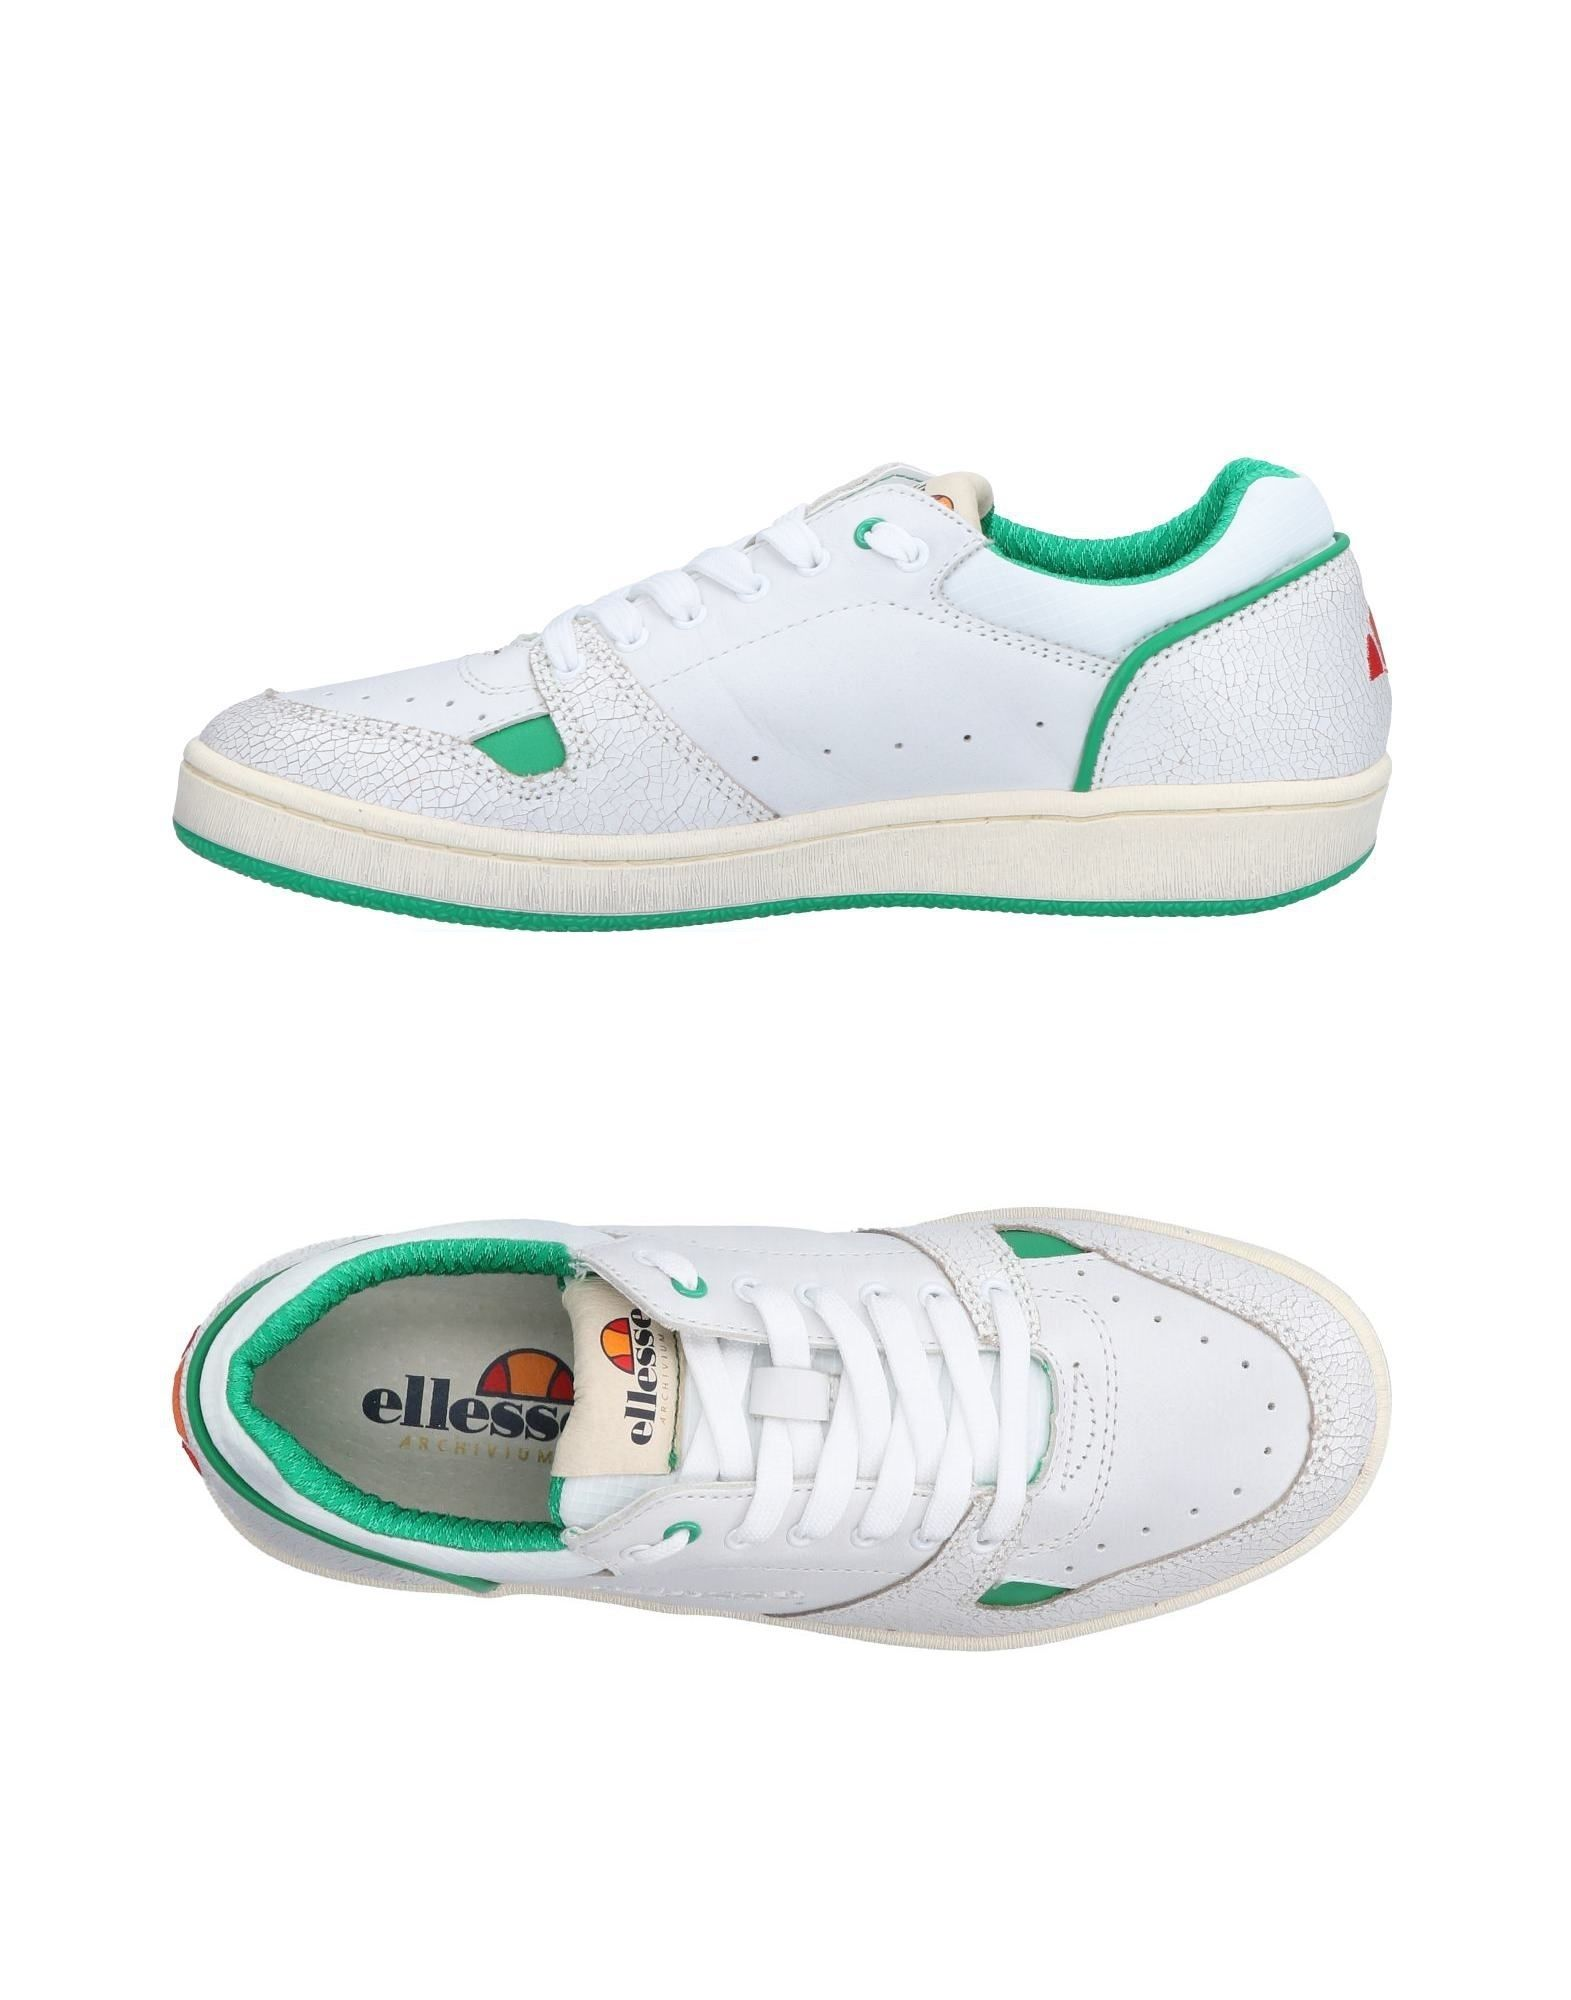 Moda Sneakers Ellesse Uomo - - - 11490454IN 186d91